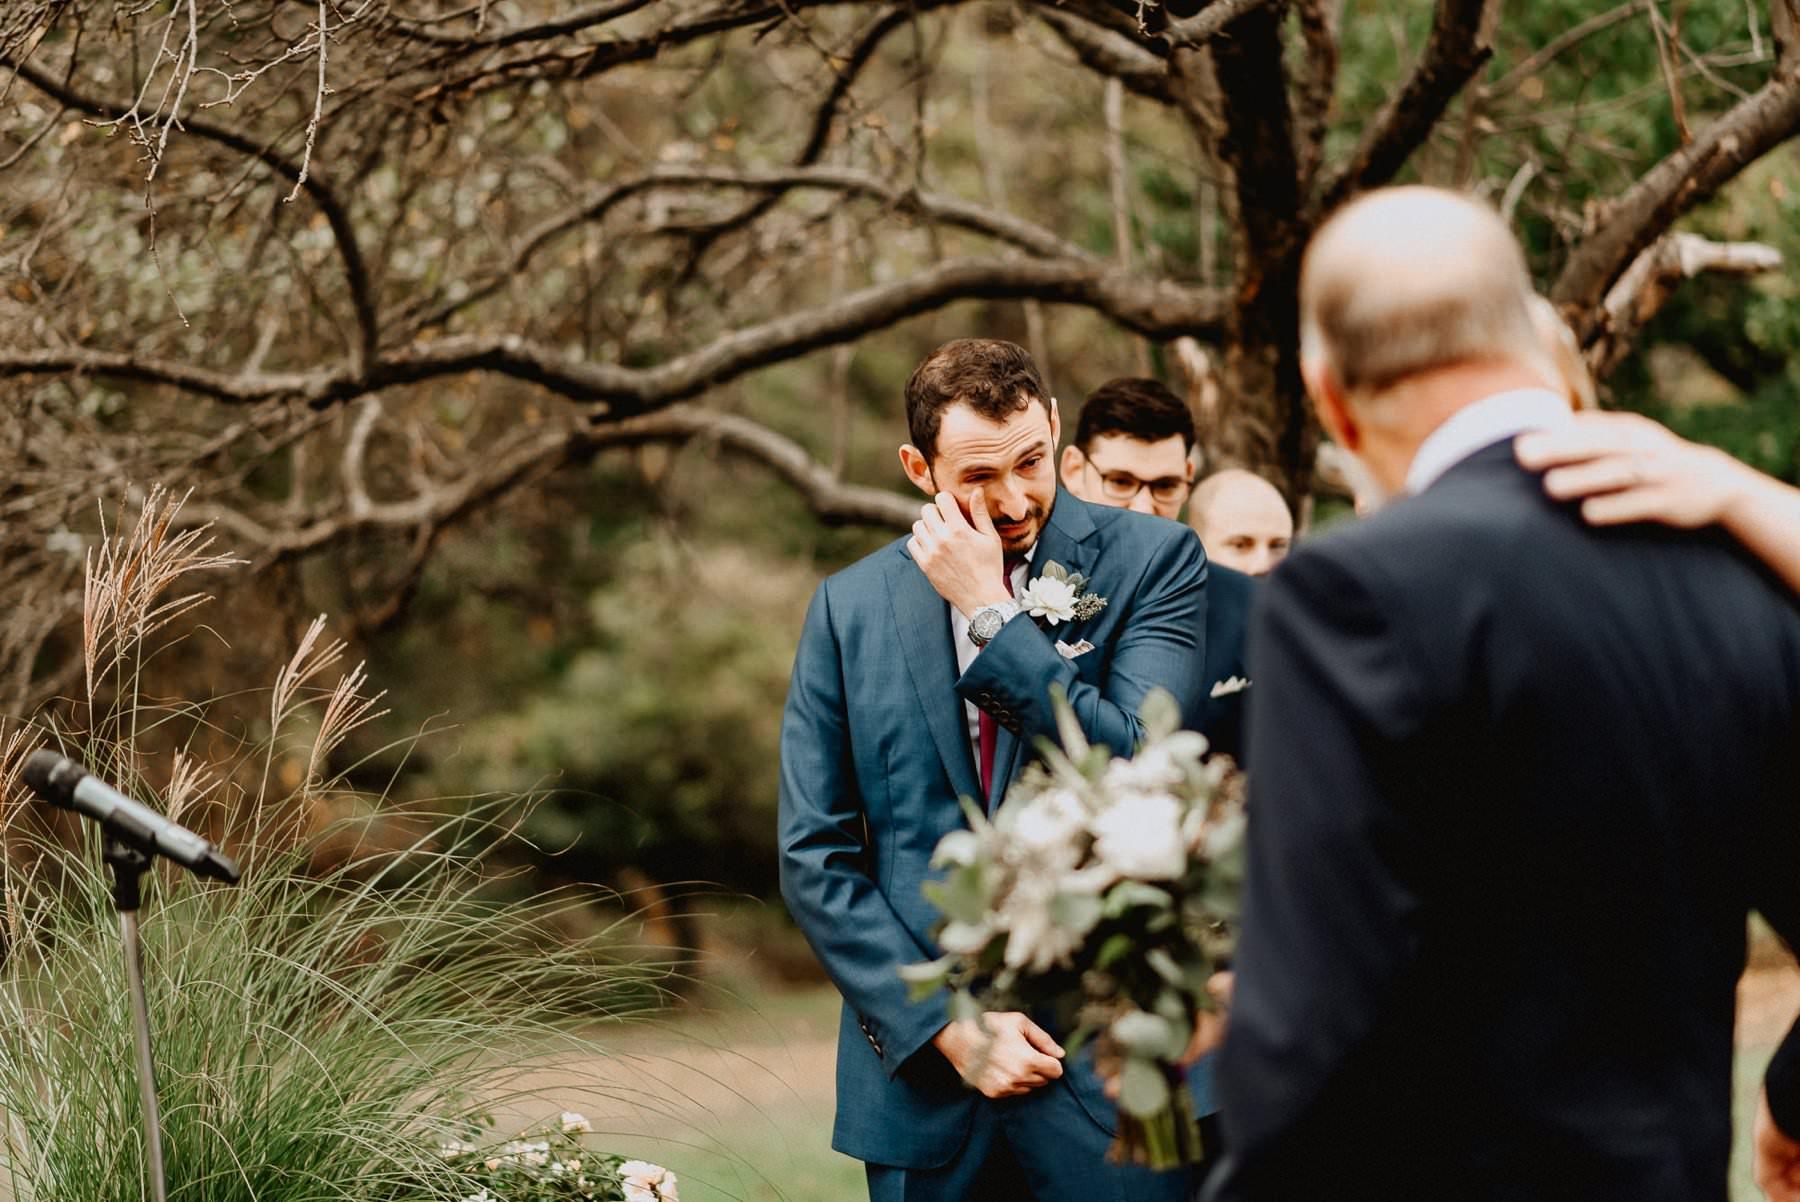 John_James_Audubon_Center_wedding-43.jpg